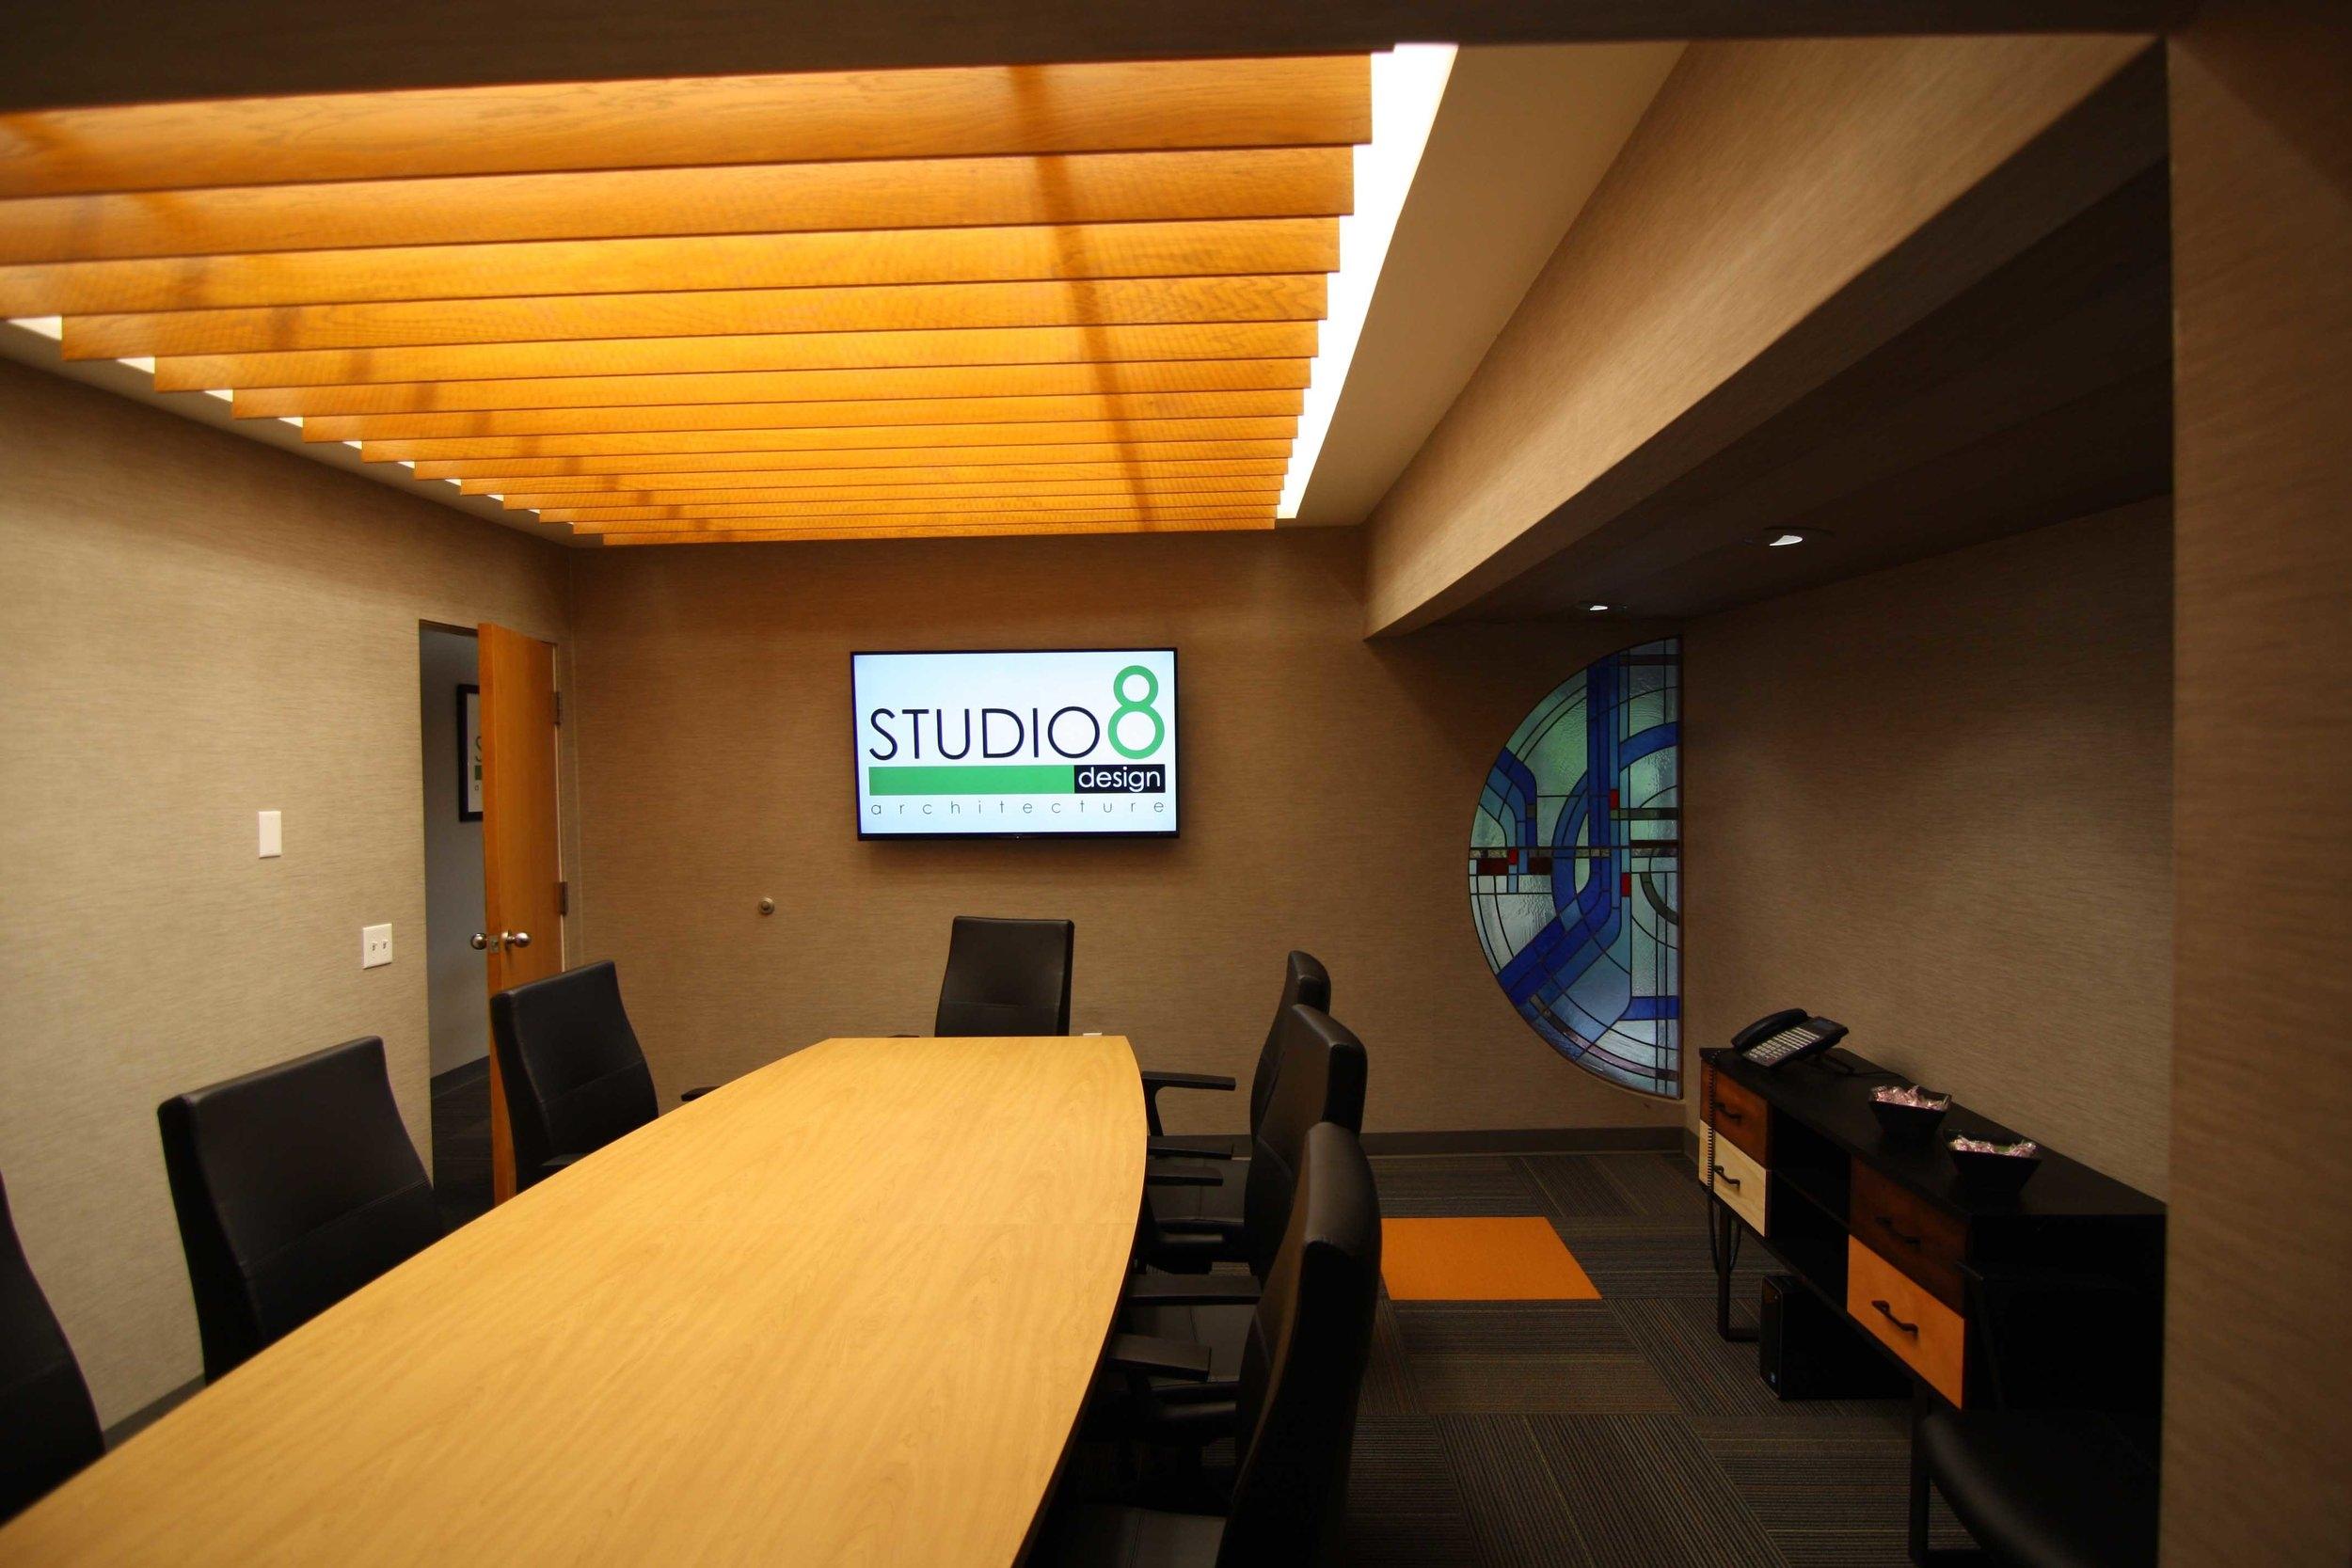 Studio 8 Design Conference Room